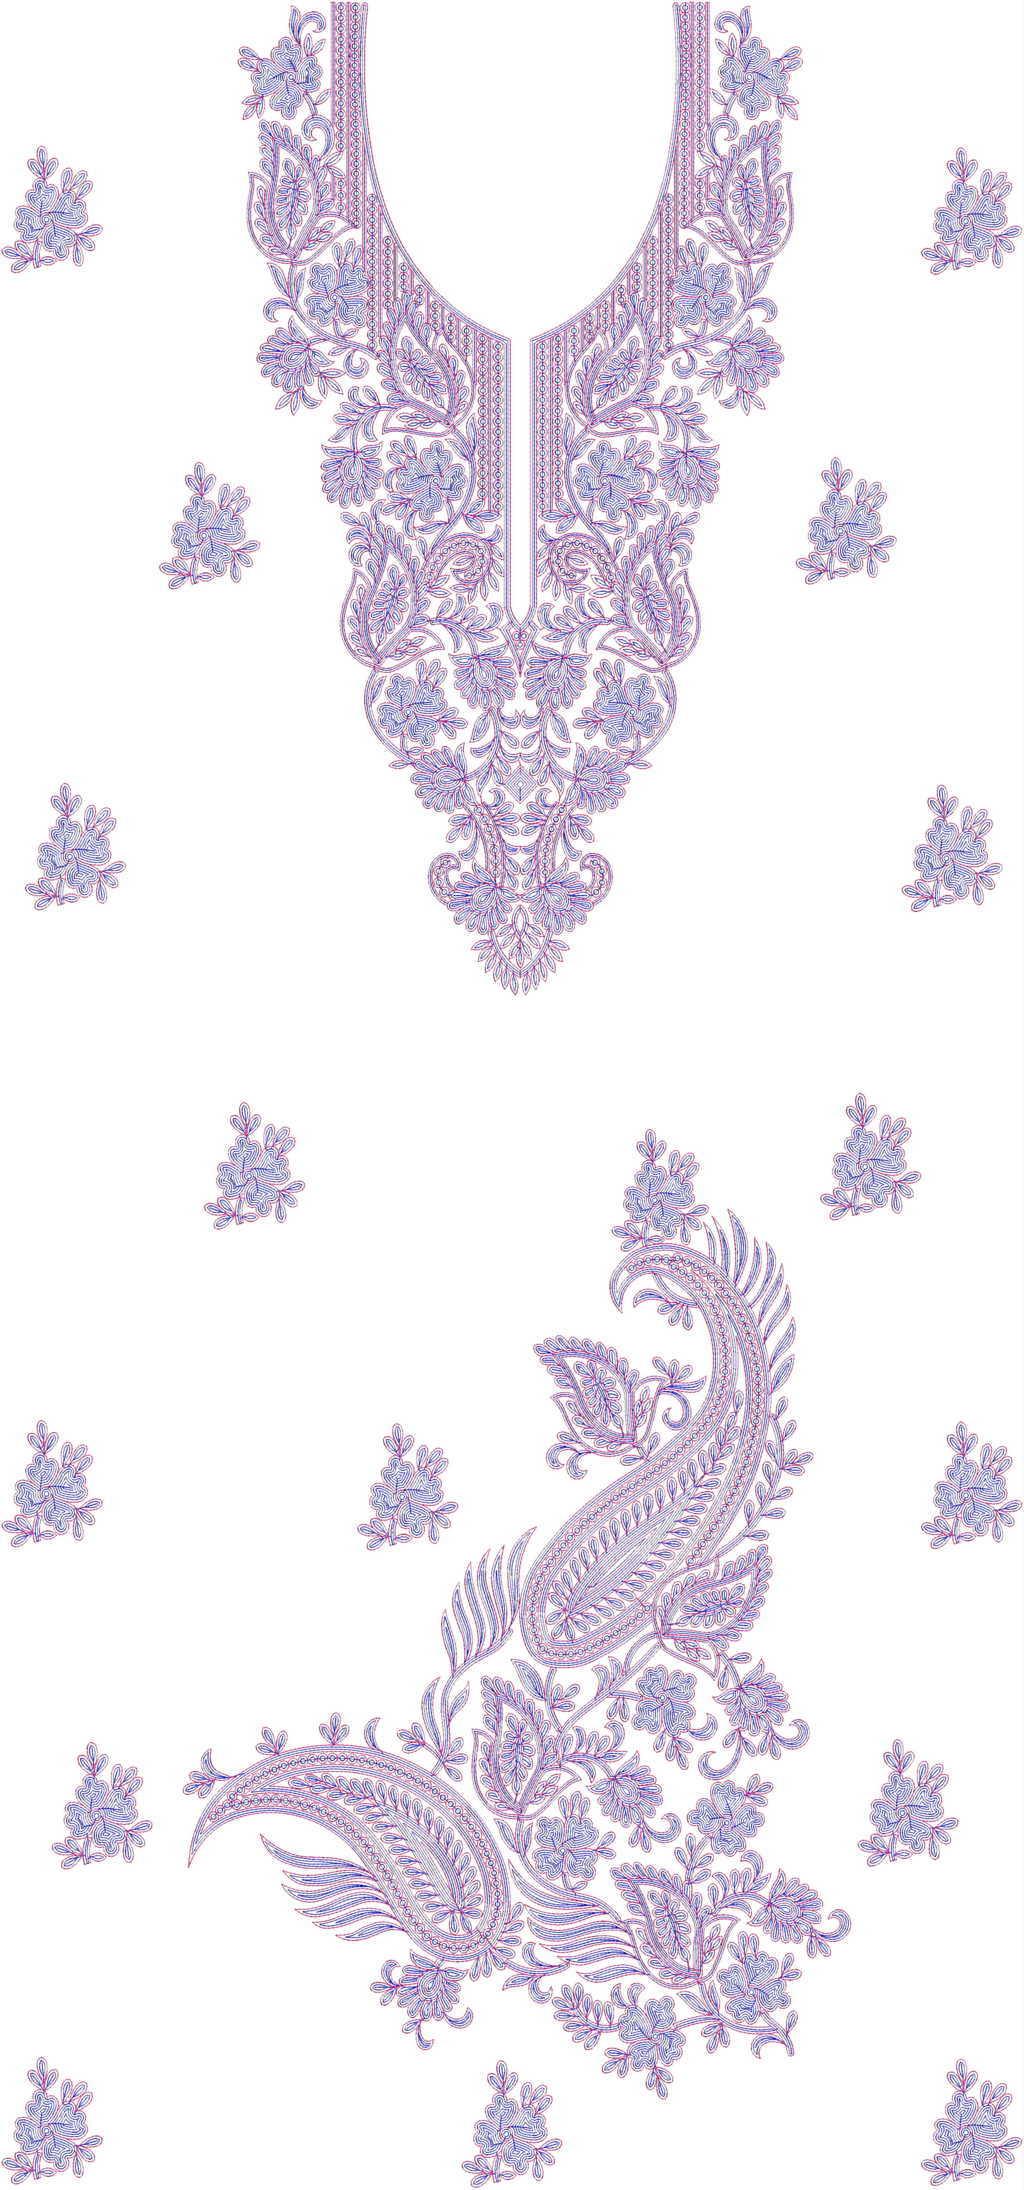 Single head Top & Duppata Embroidery Design